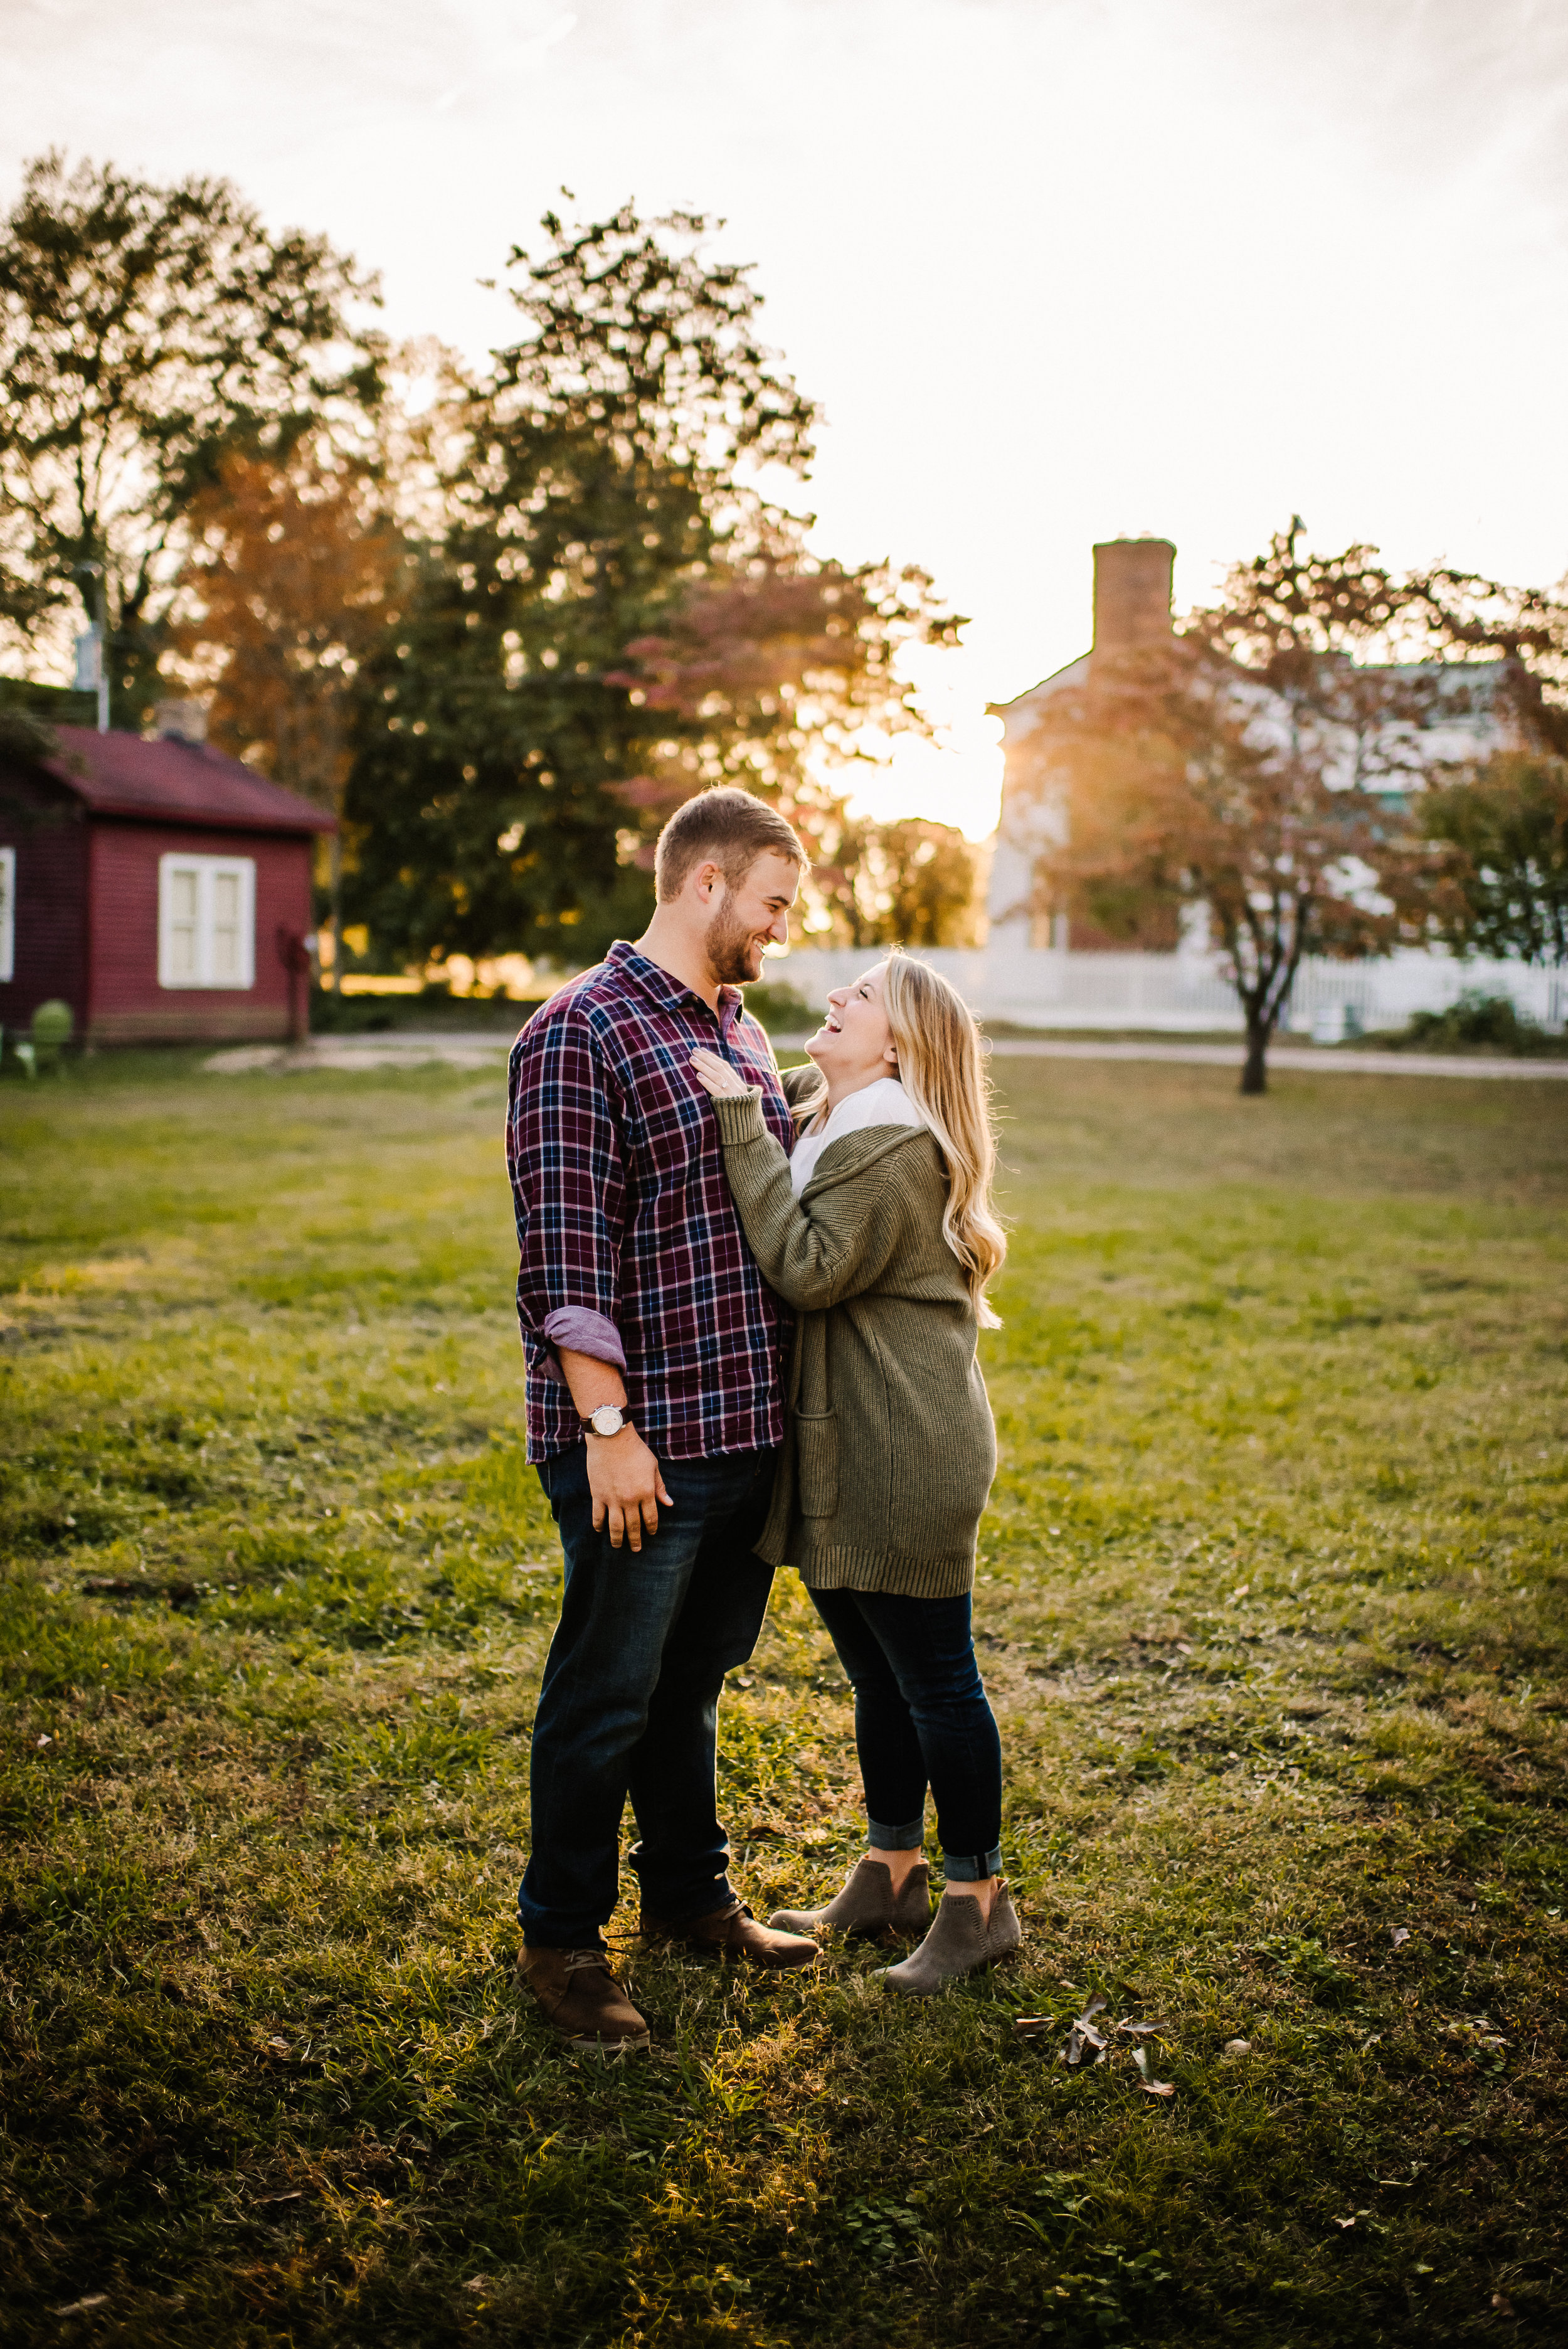 Romantic Fall Engagement Photography_Alexis & Jacob_Ashley Benham Photography-115.jpg